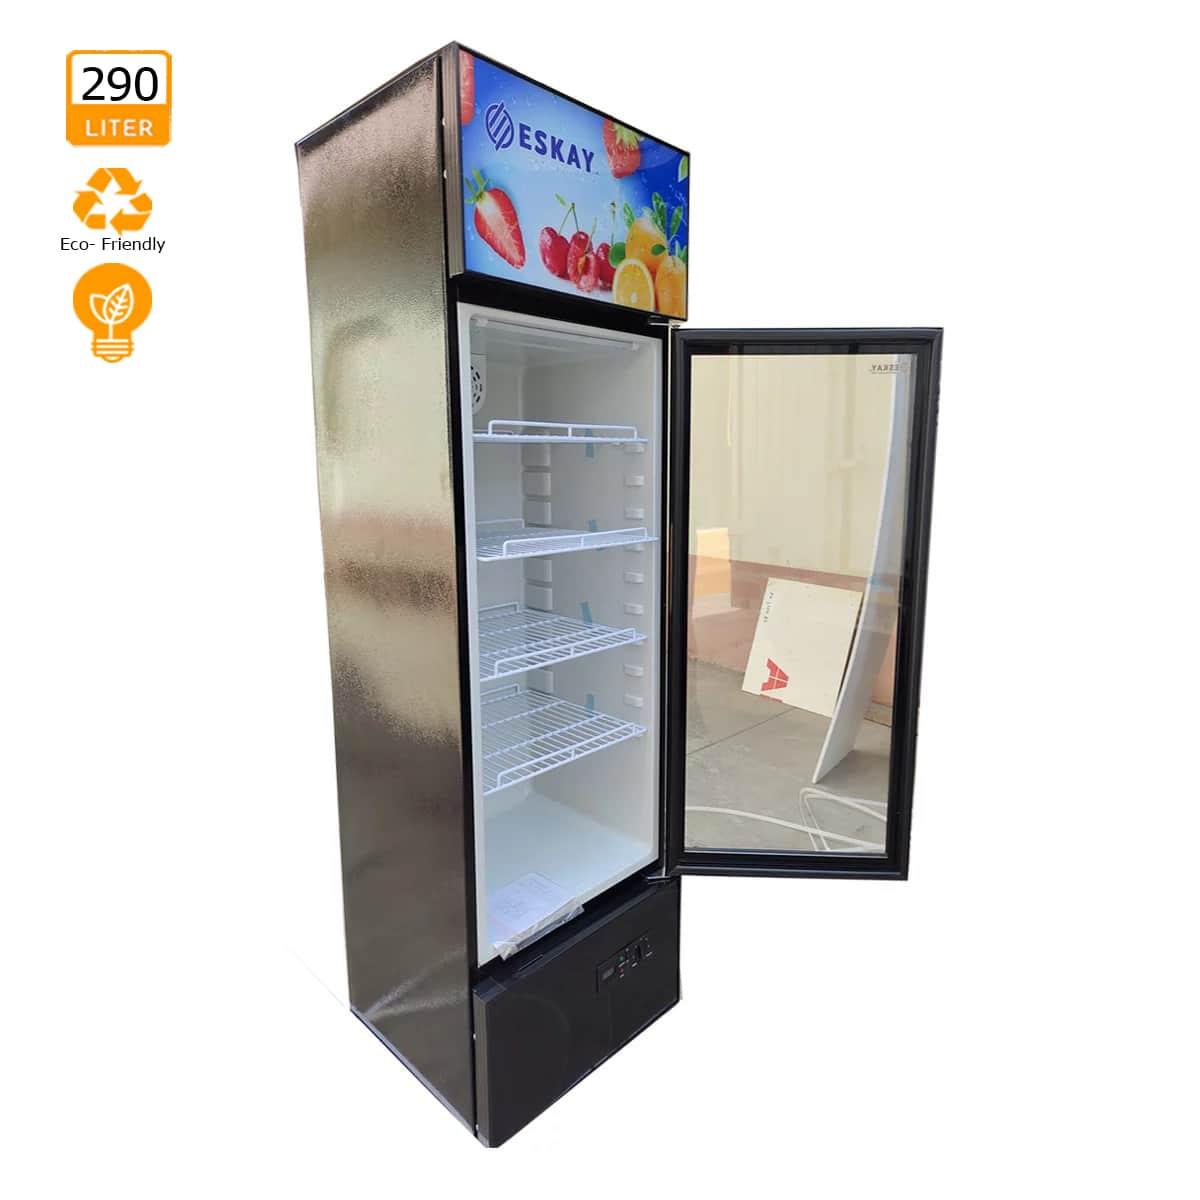 eskay-display-fridge